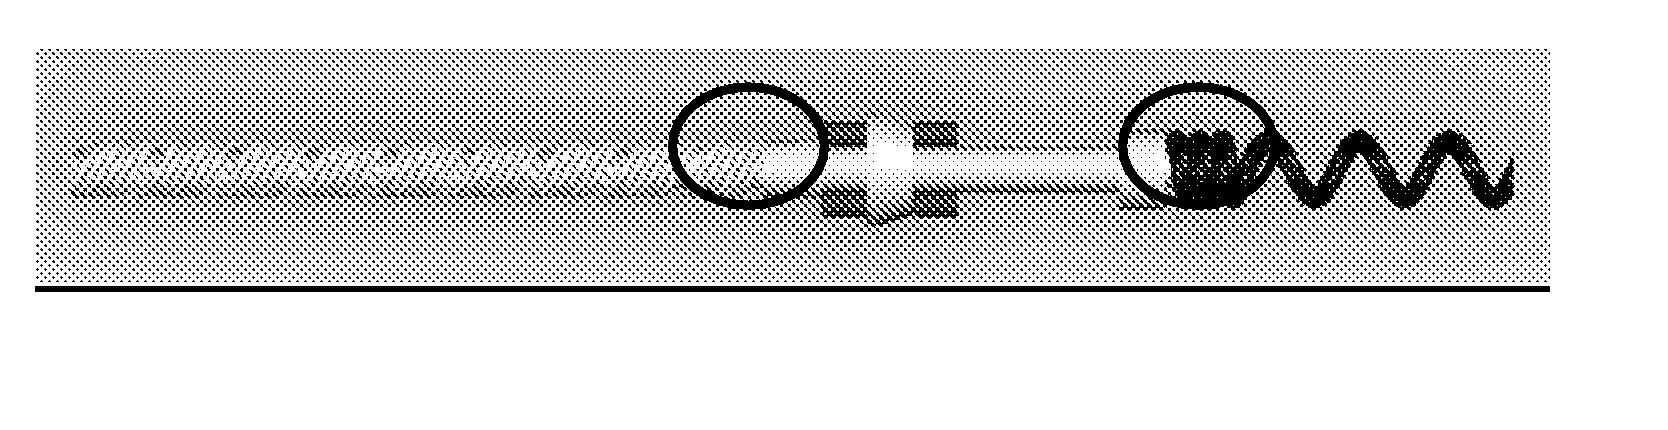 Figure US20070276458A1-20071129-P00014